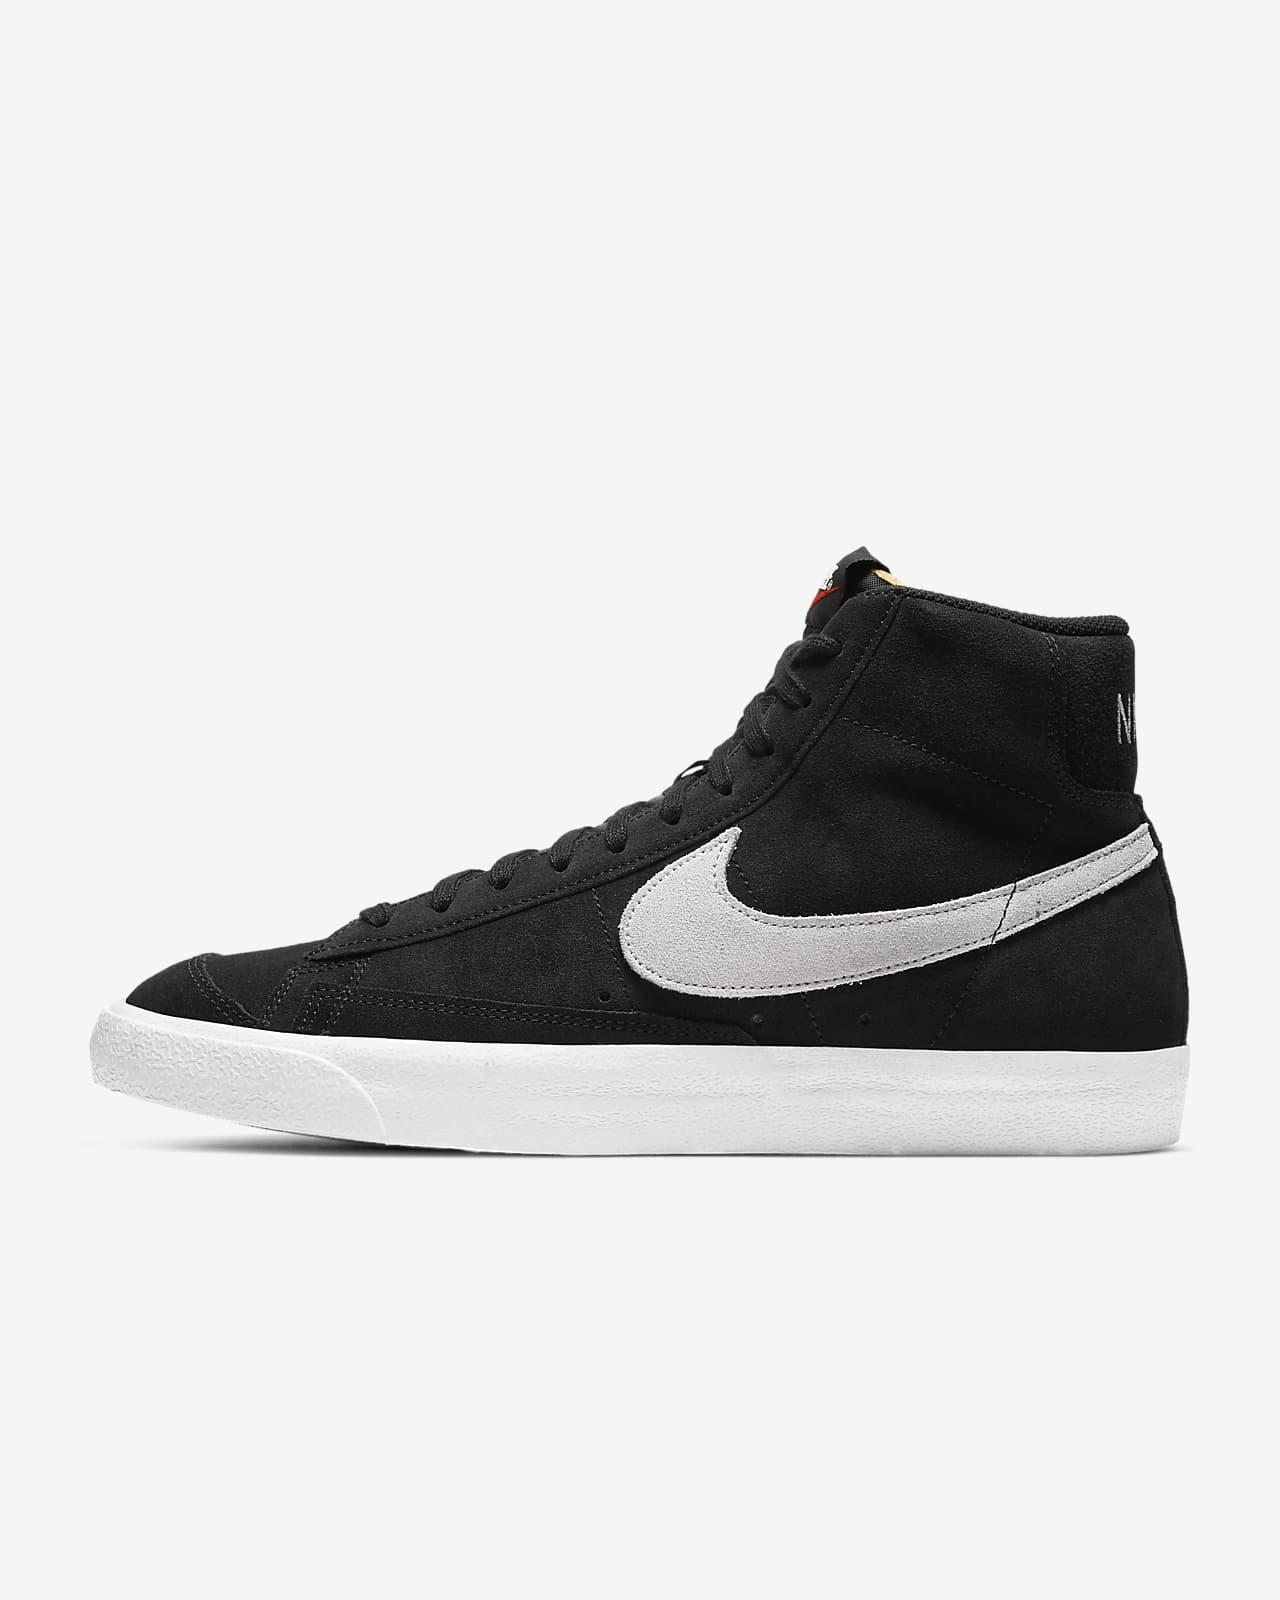 Nike Blazer Mid '77 Suede Shoe. Nike SG